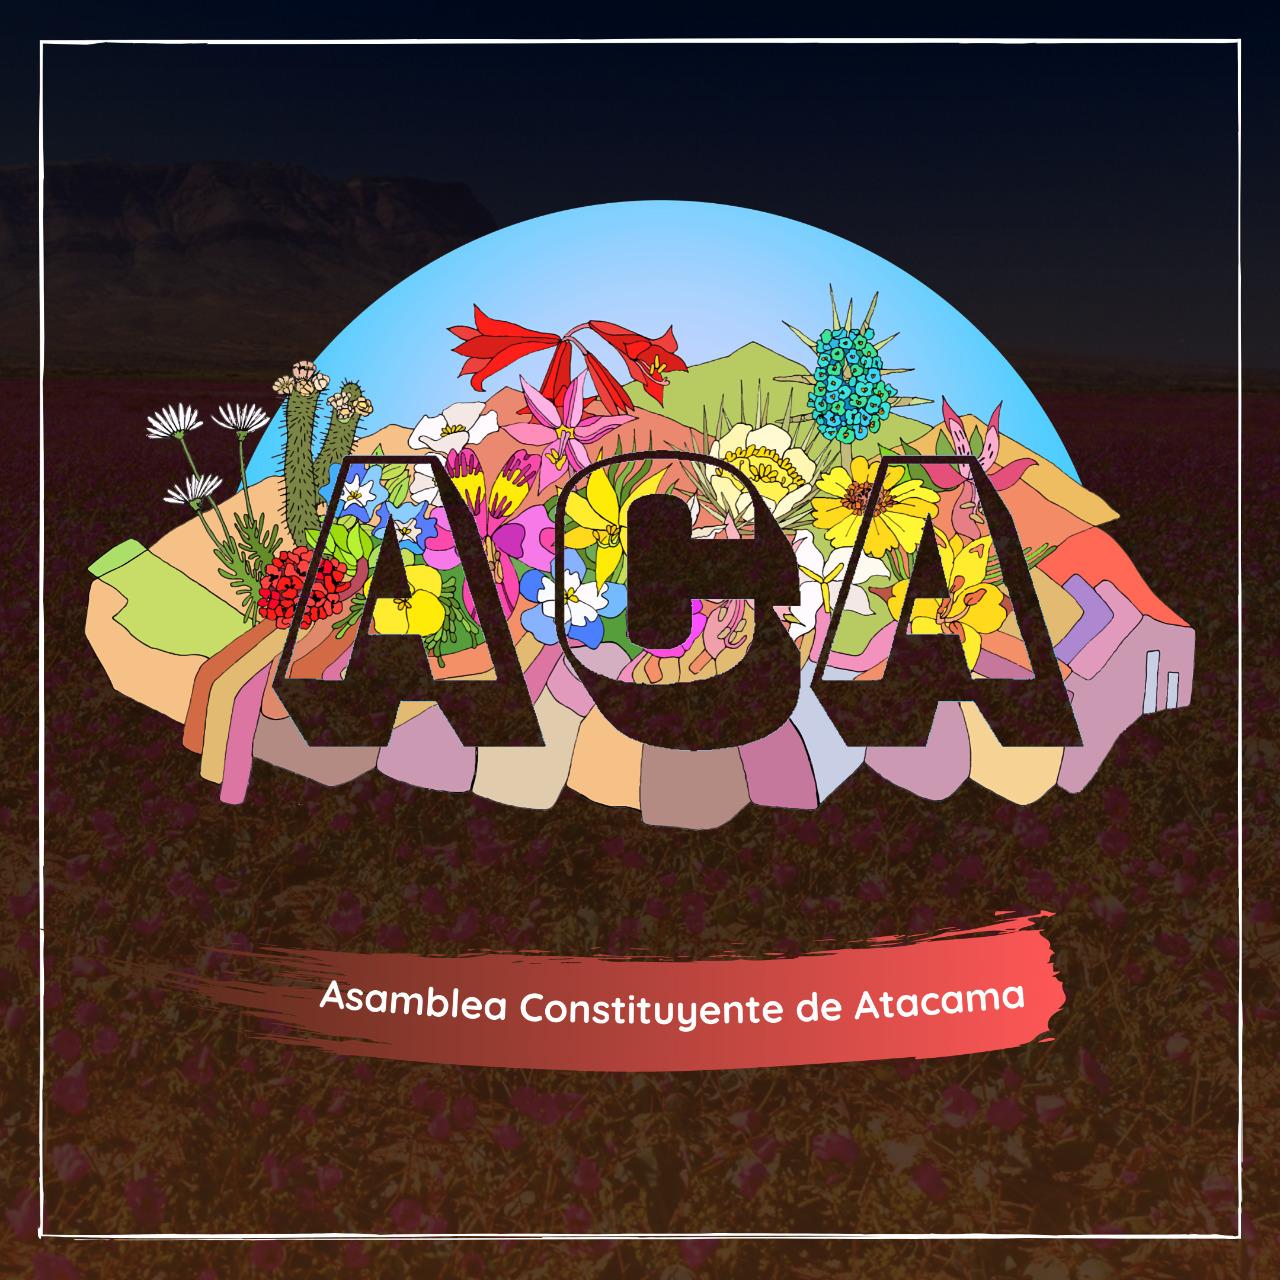 Asamblea Constituyente de Atacama presentó sus pre-candidatos a la Convención Constitucional